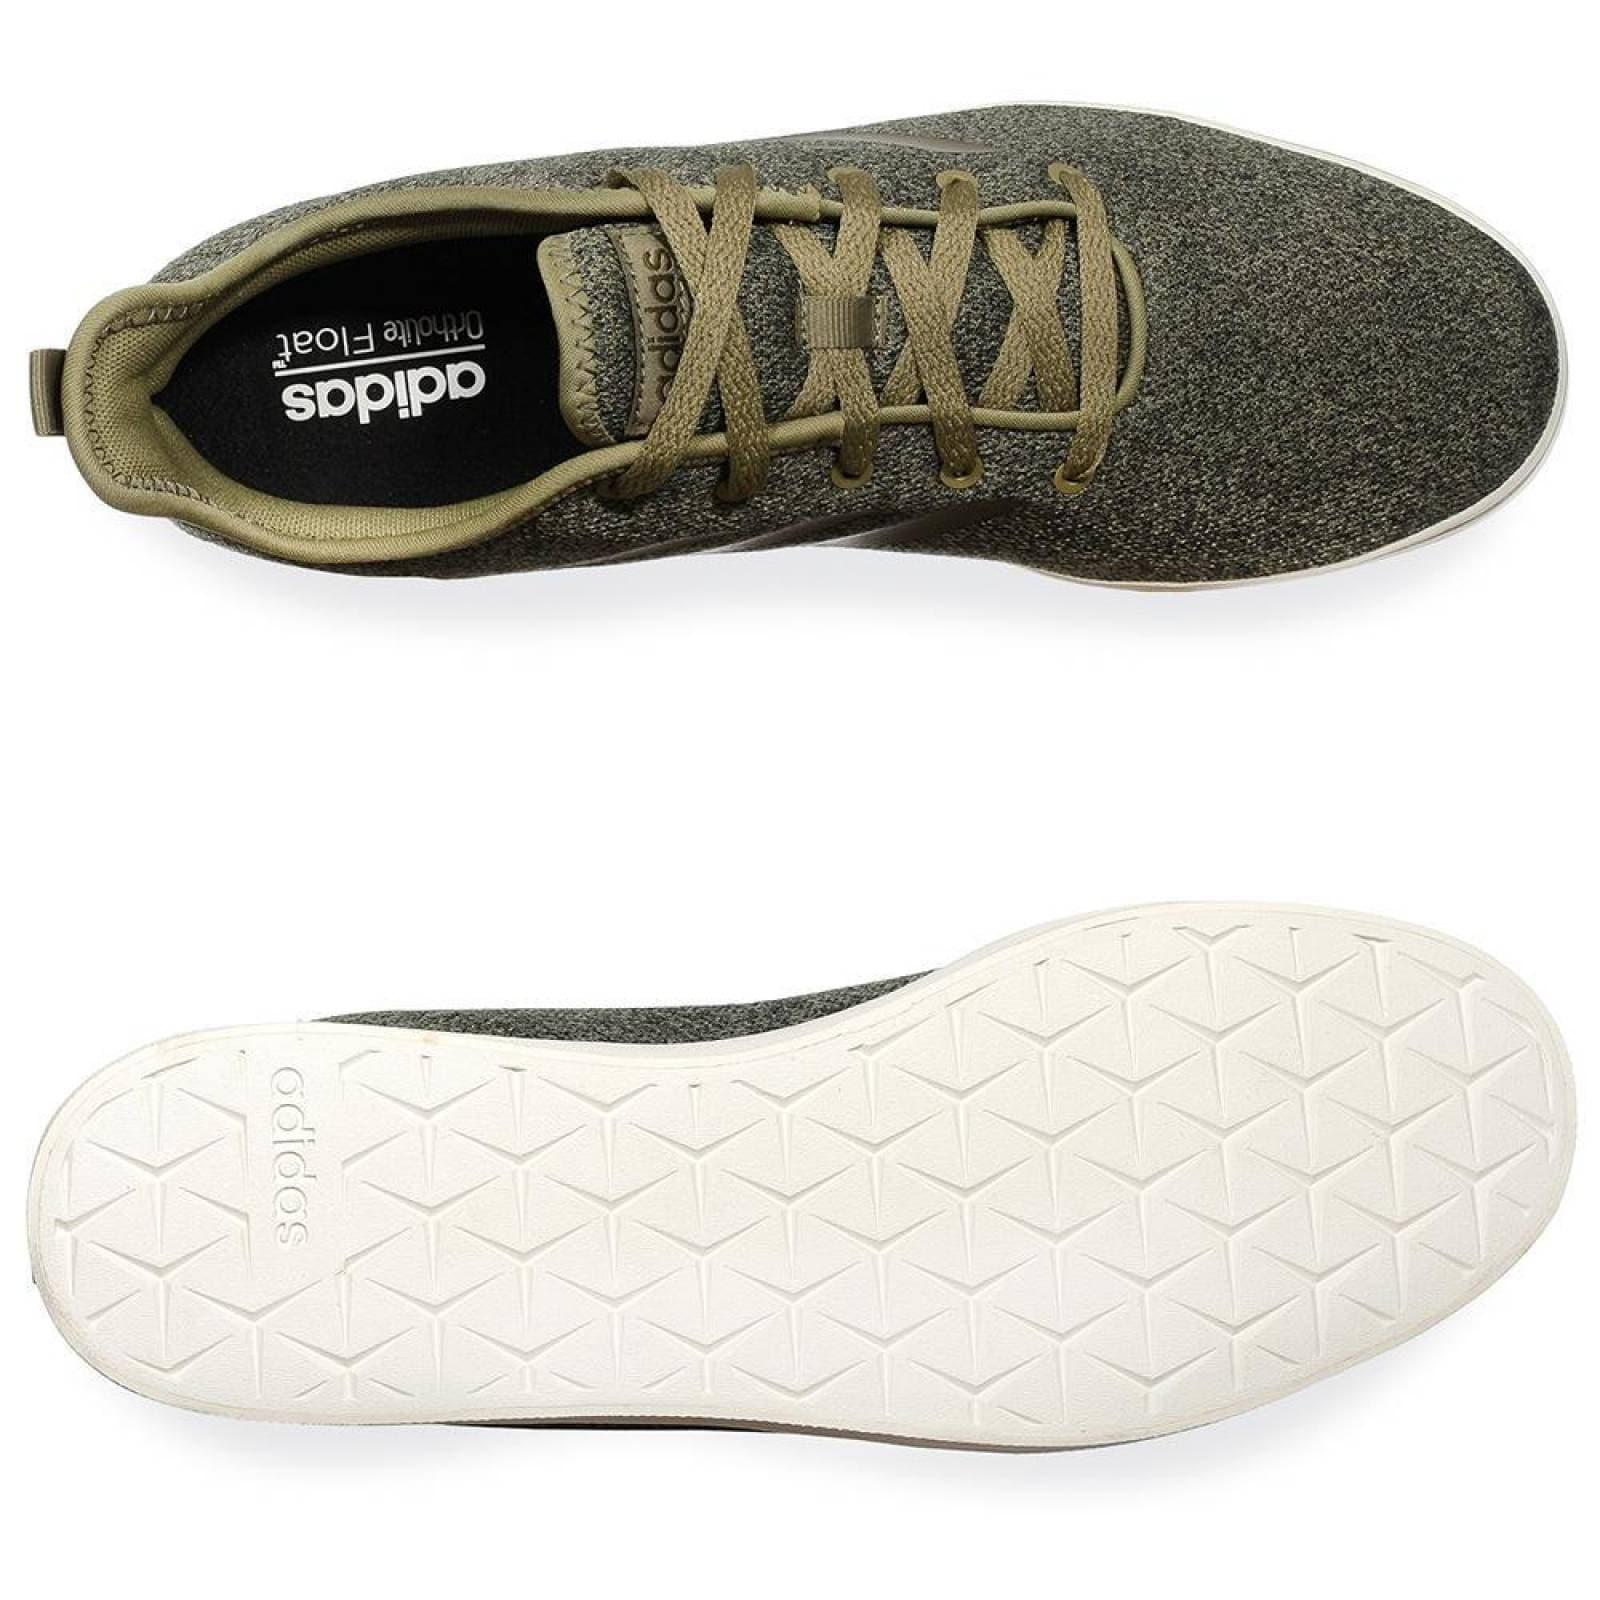 Tenis Adidas True Chill DA9850 Verde Oliva Hombre